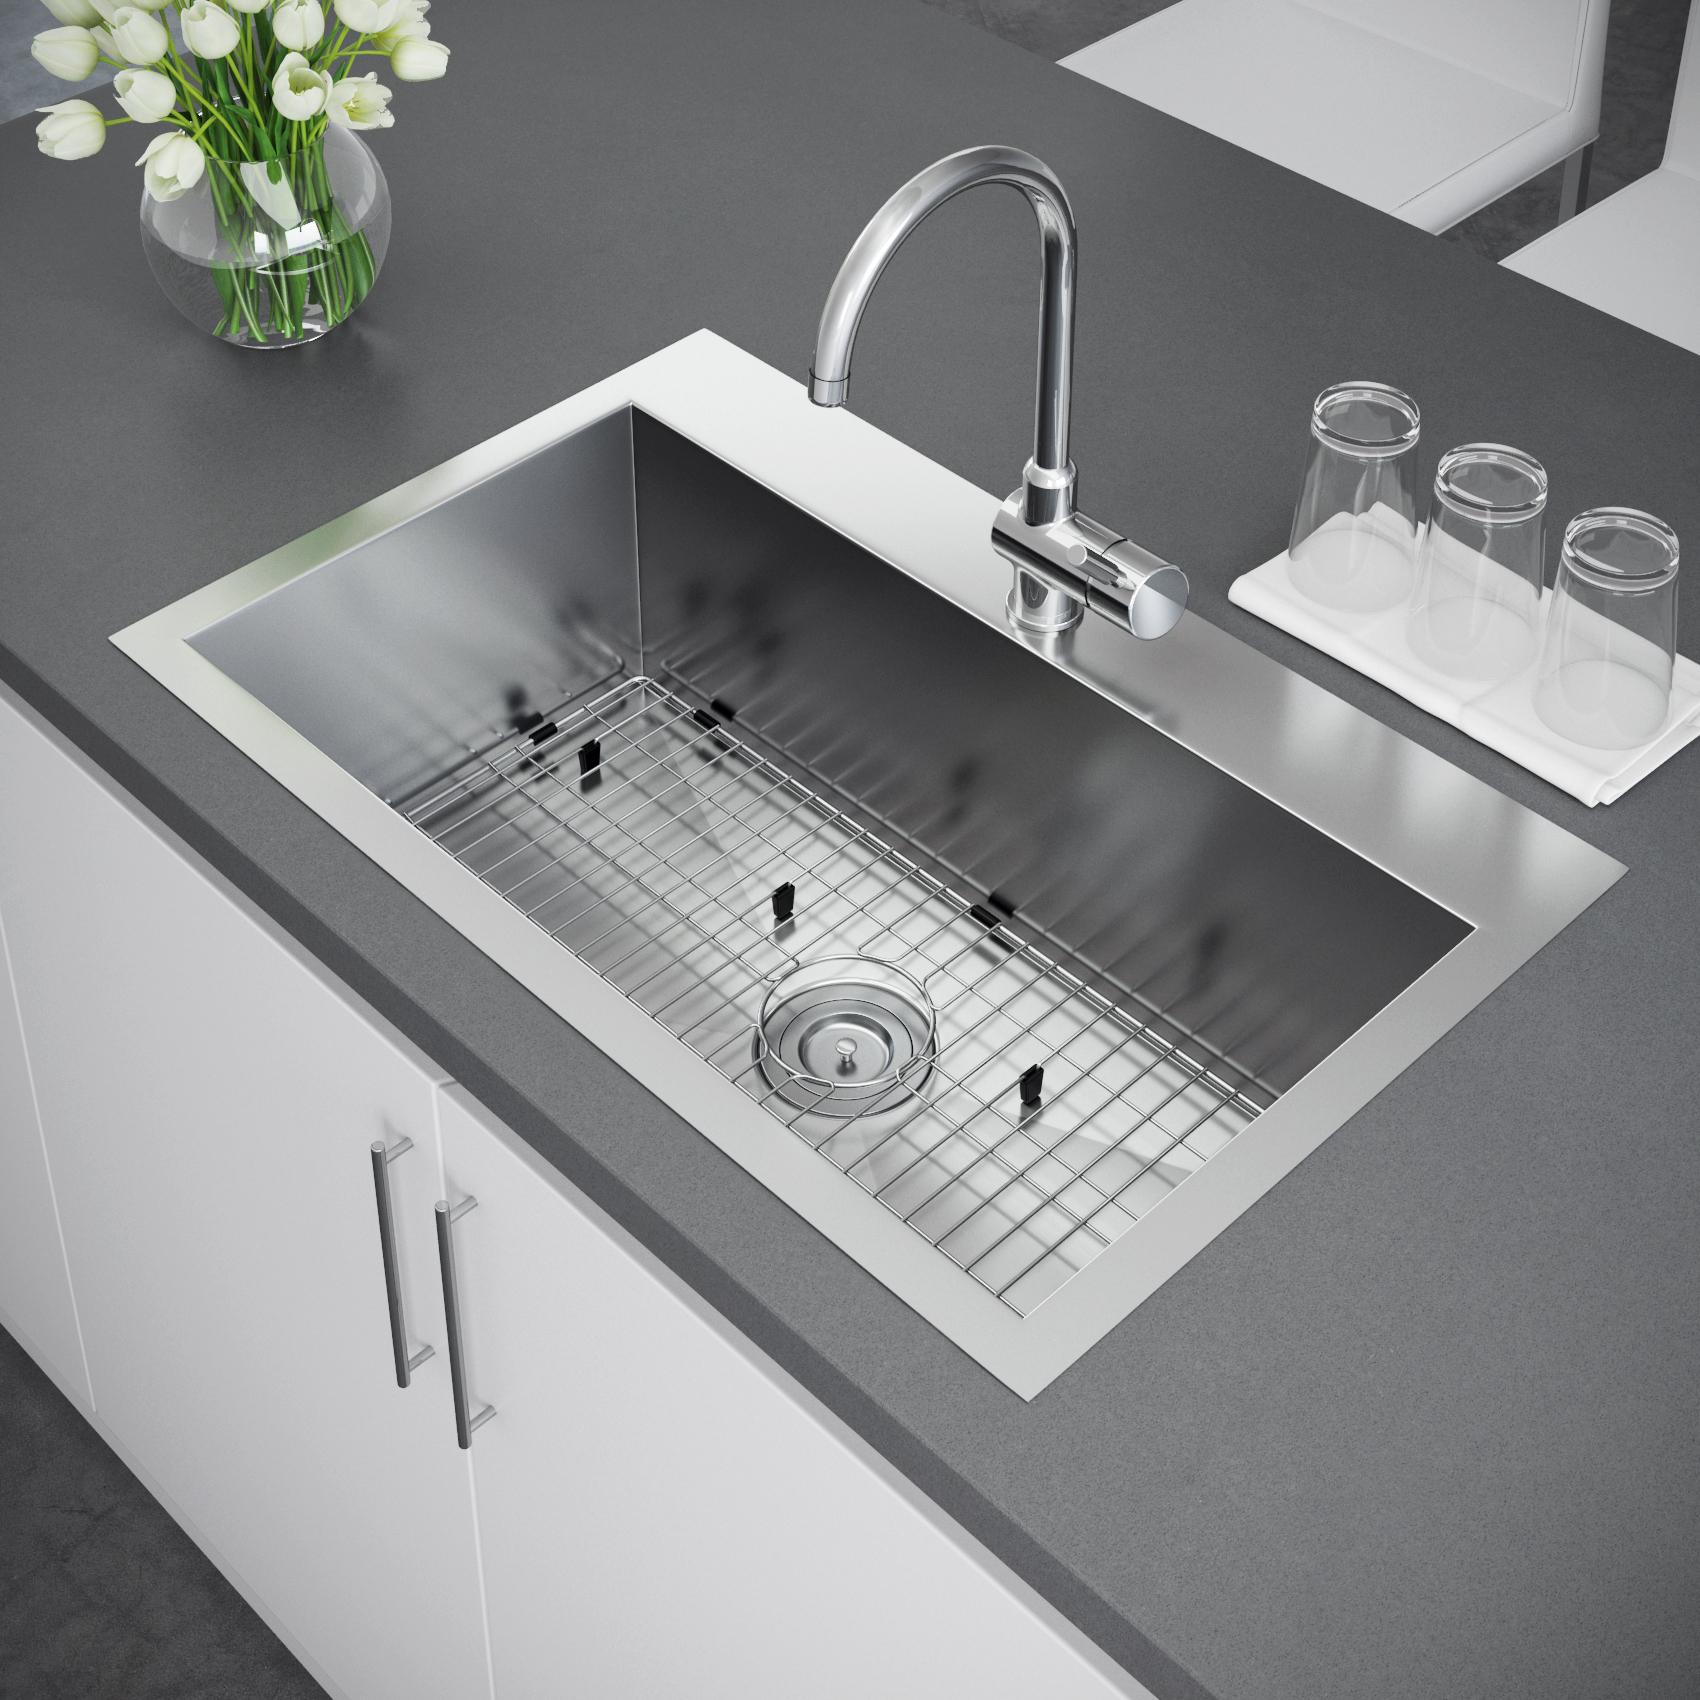 Top Mount Sink Kitchen: Exclusive Heritage 33″ X 22″ Single Bowl Topmount